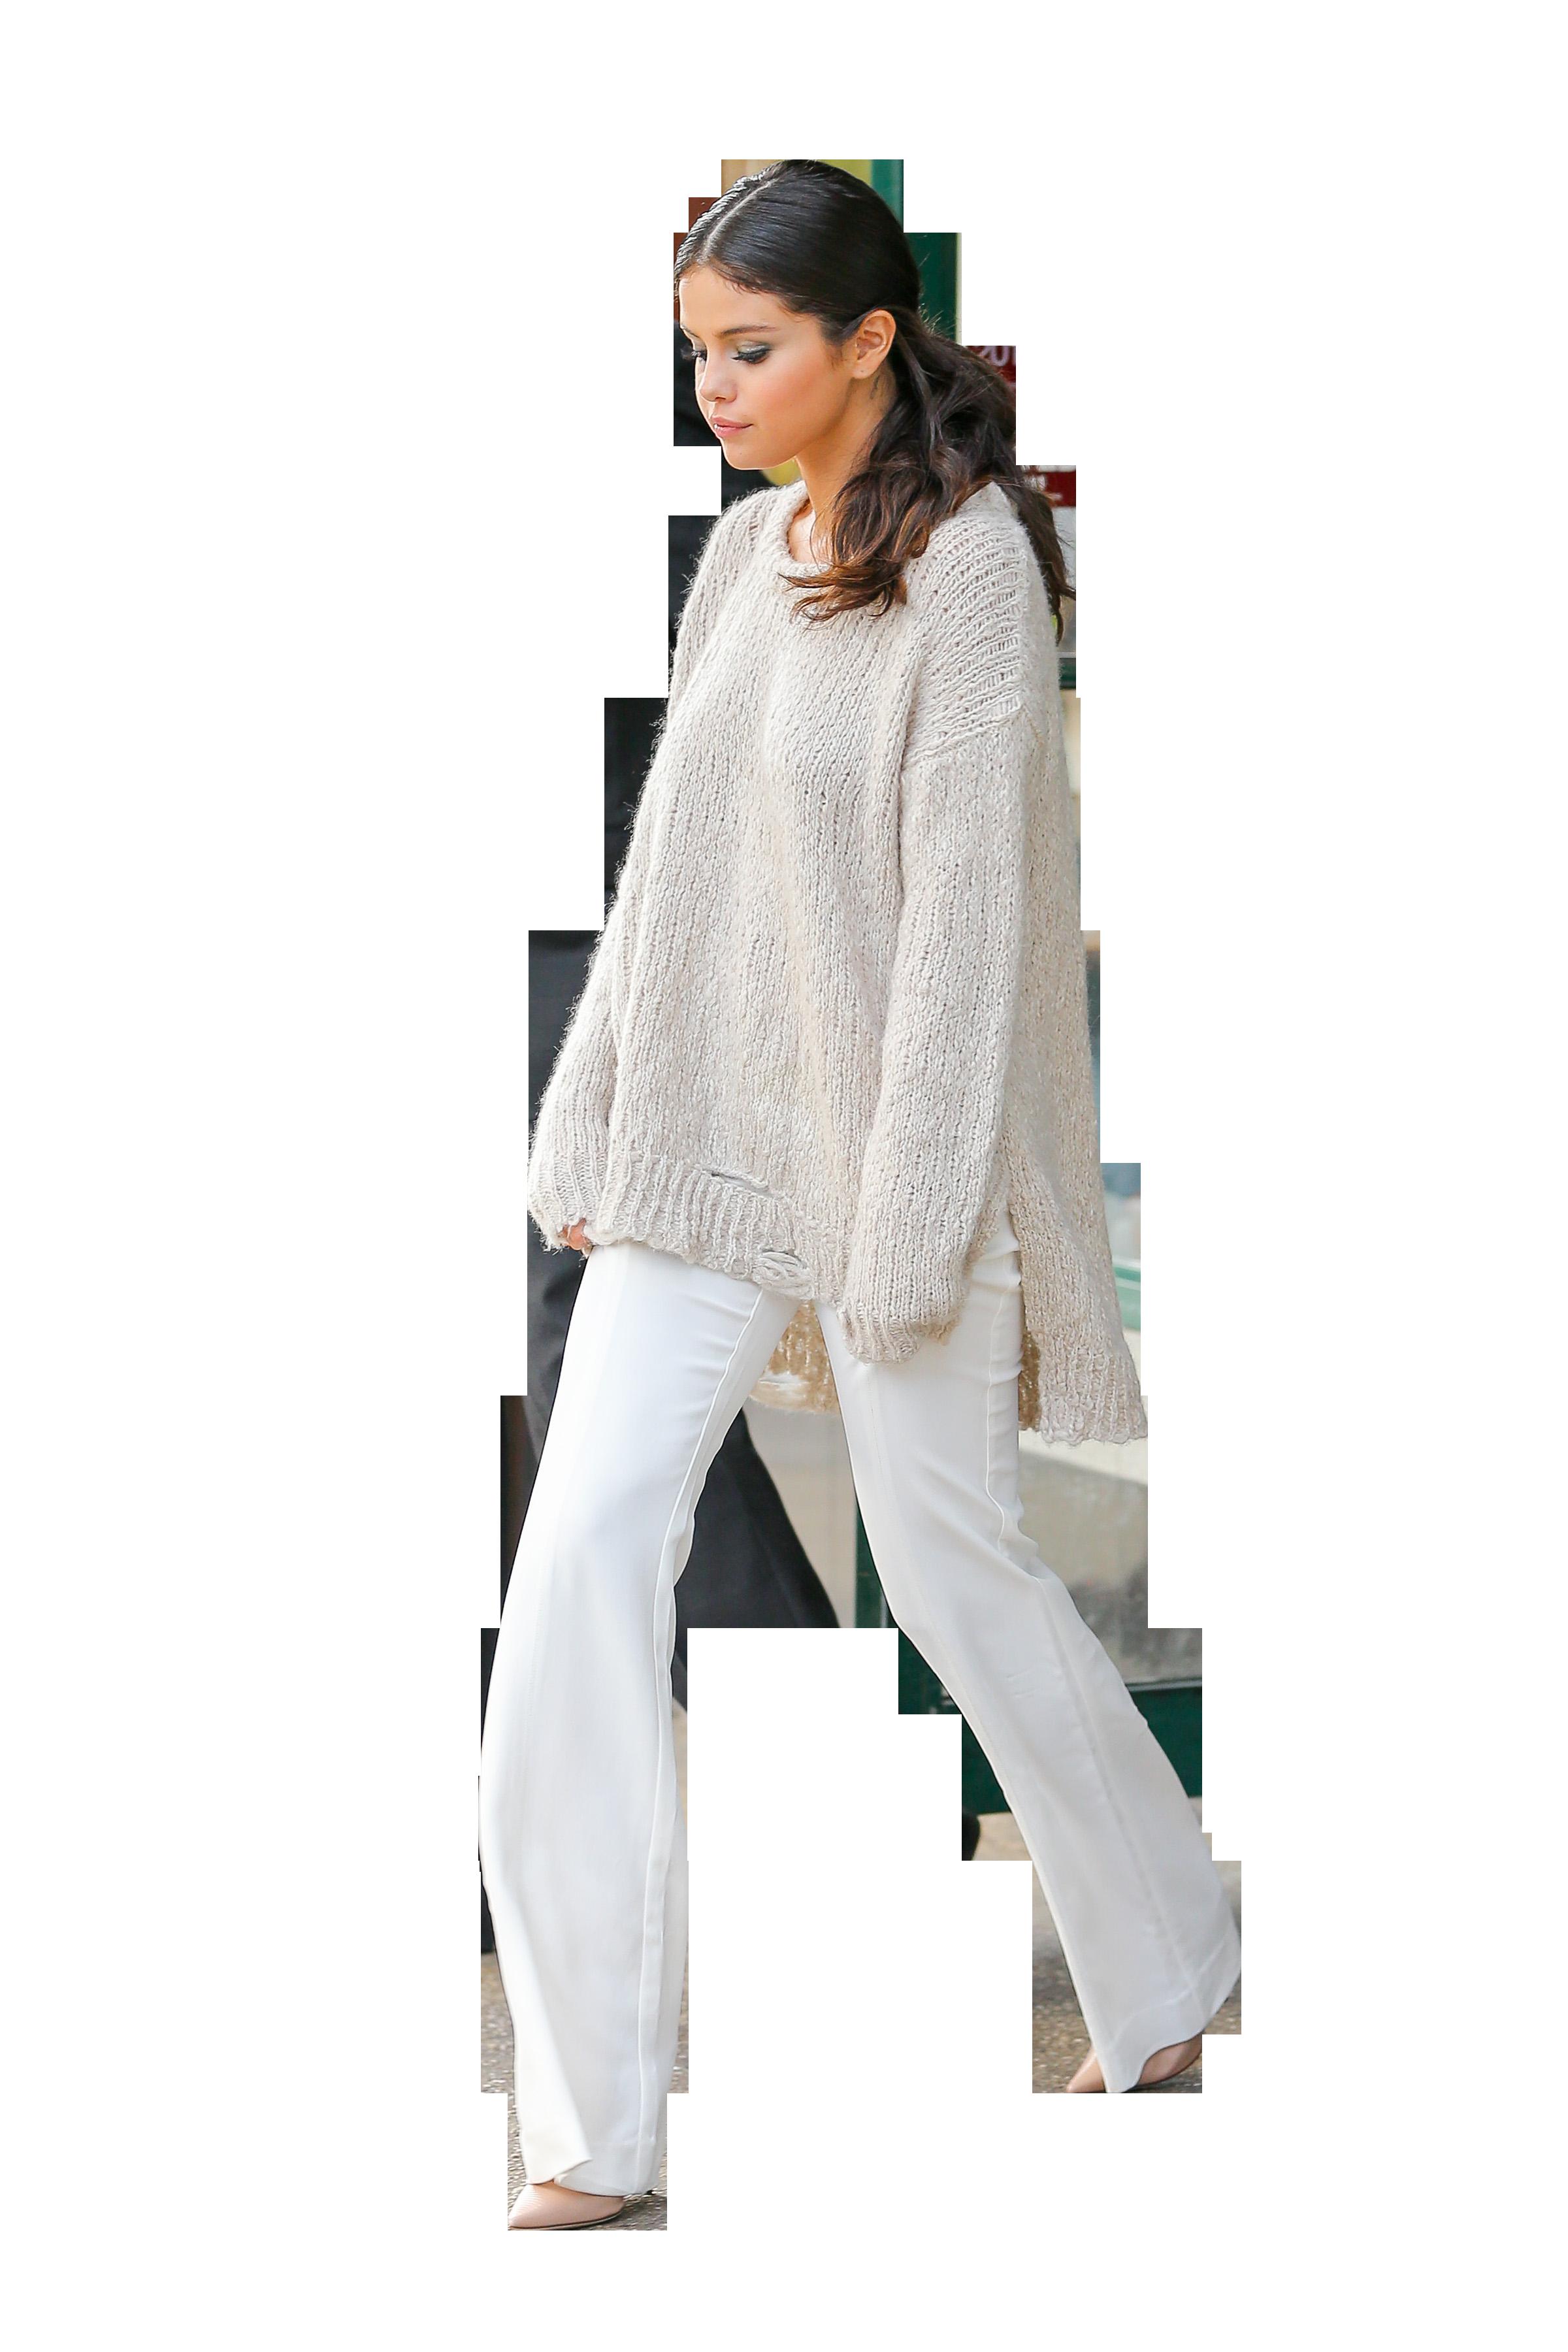 Selena Gomez PNG Image